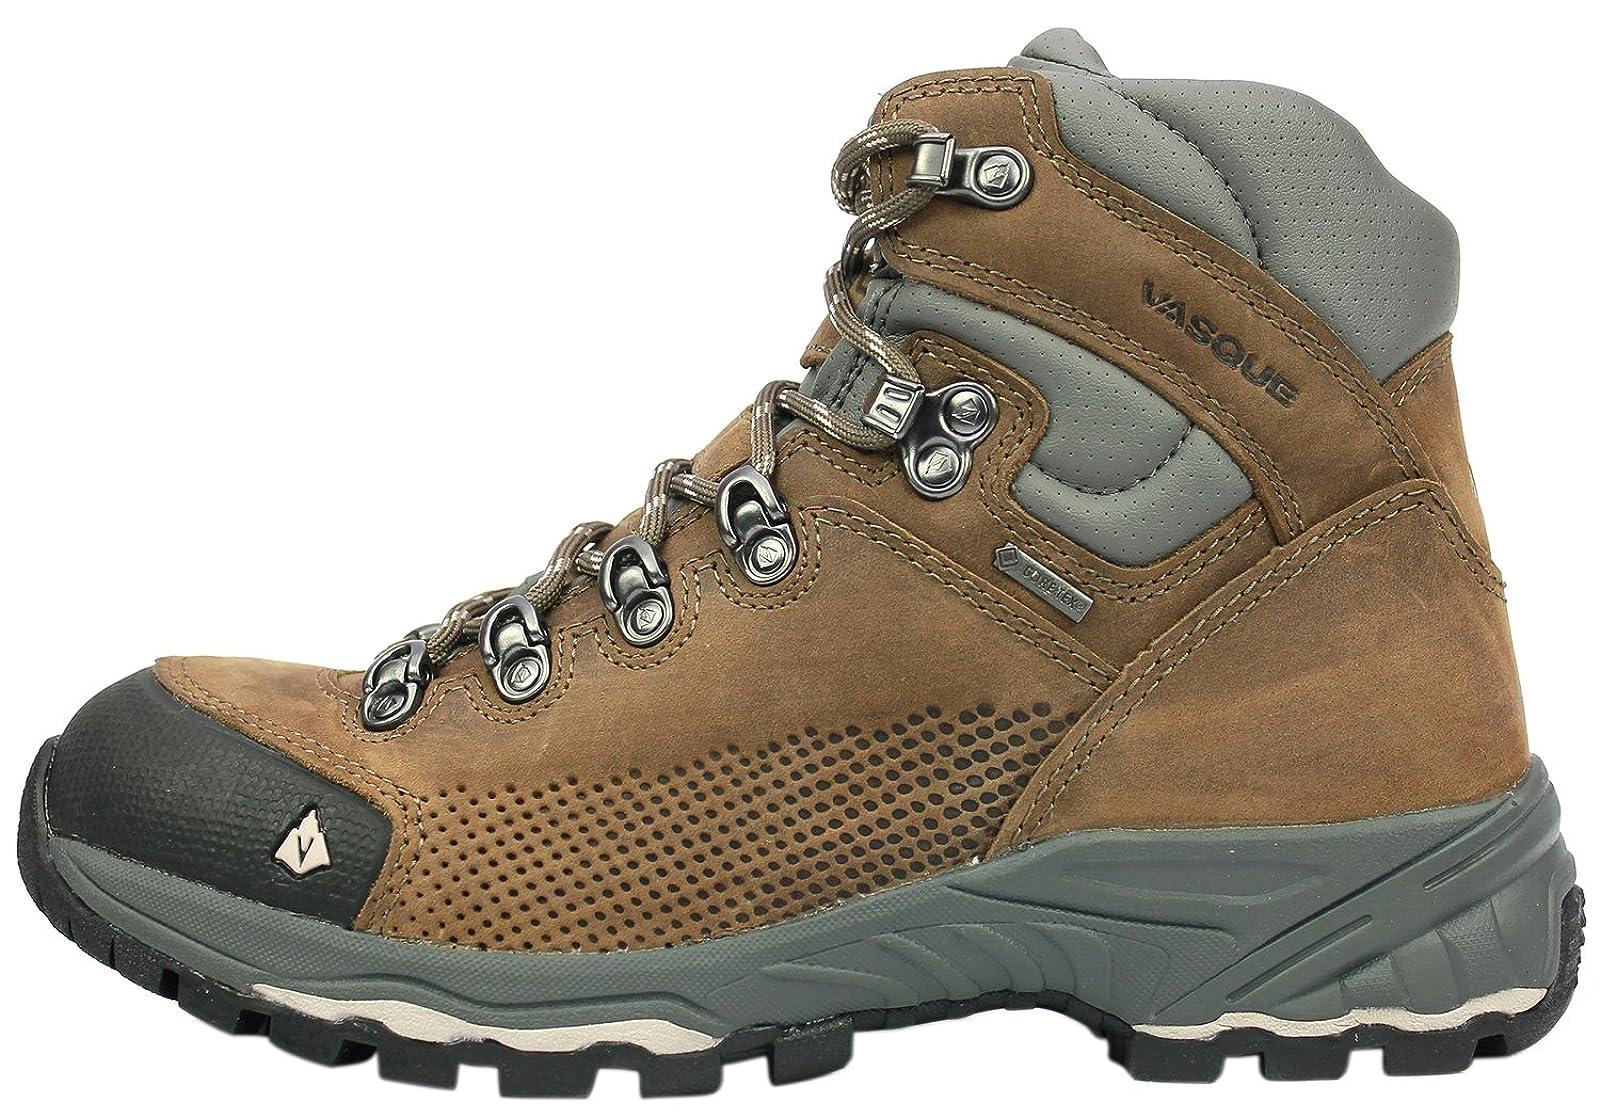 Vasque Women's St. Elias Gore-Tex Hiking Boot 8 M US Women - 8